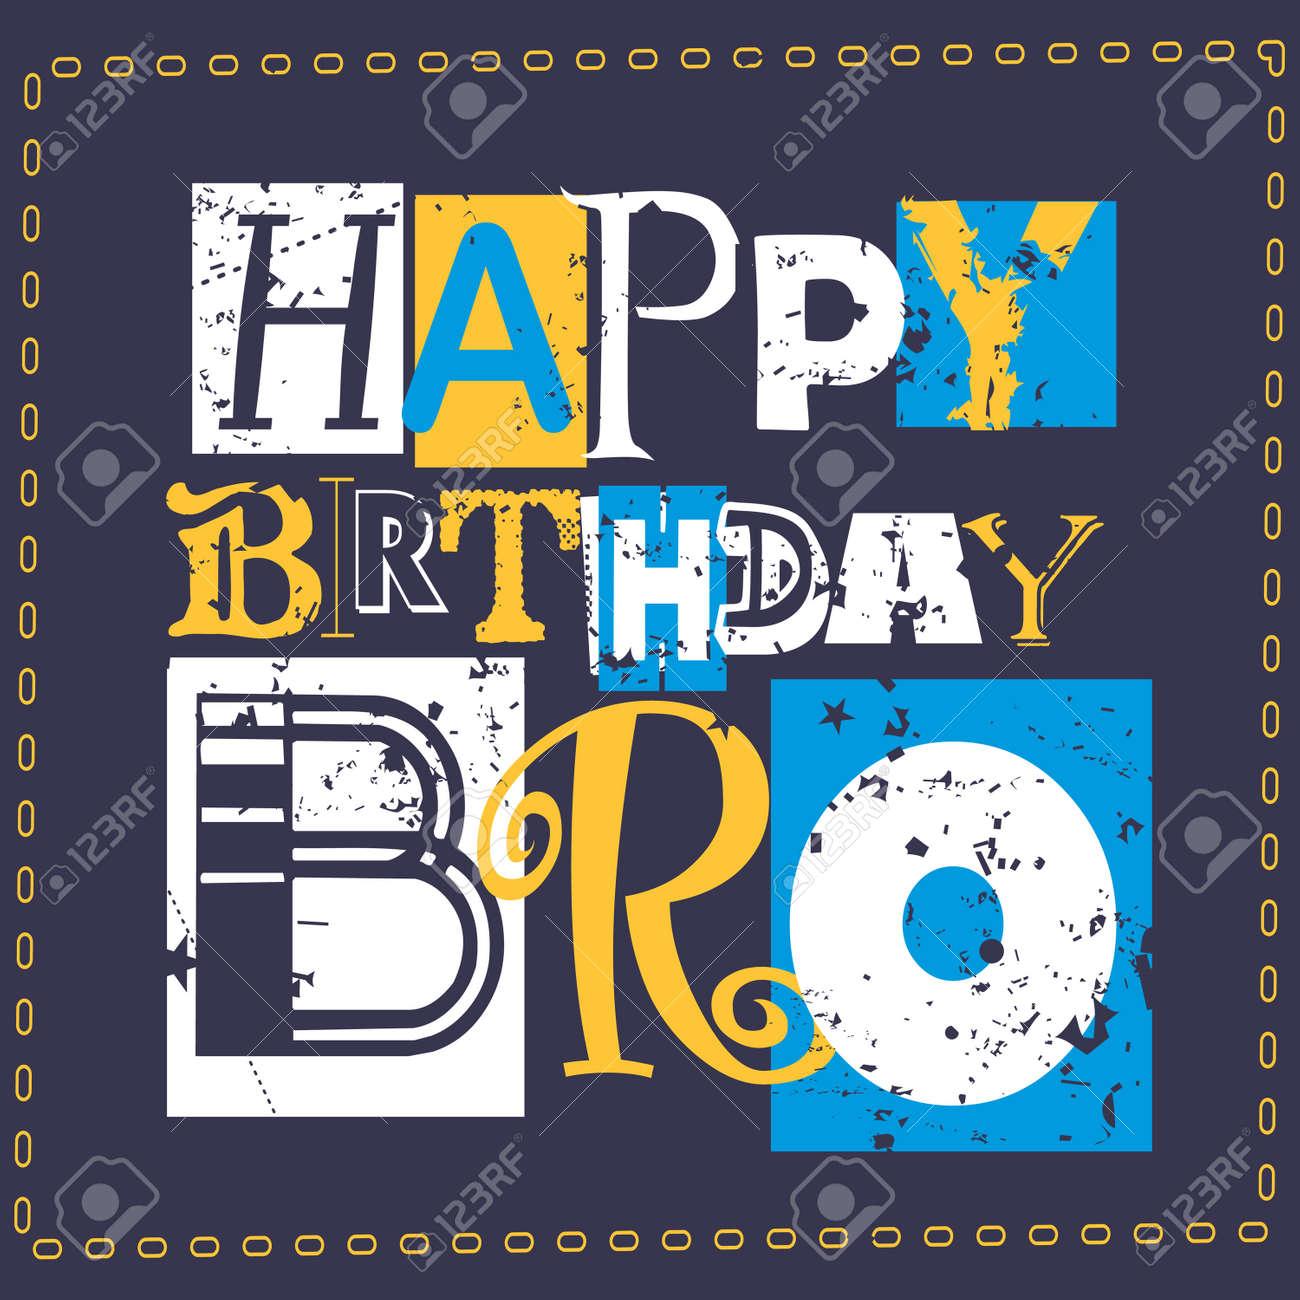 Happy Birthday Card Happy Birthday Bro Vector Illustration Royalty Free Cliparts Vectors And Stock Illustration Image 57012643